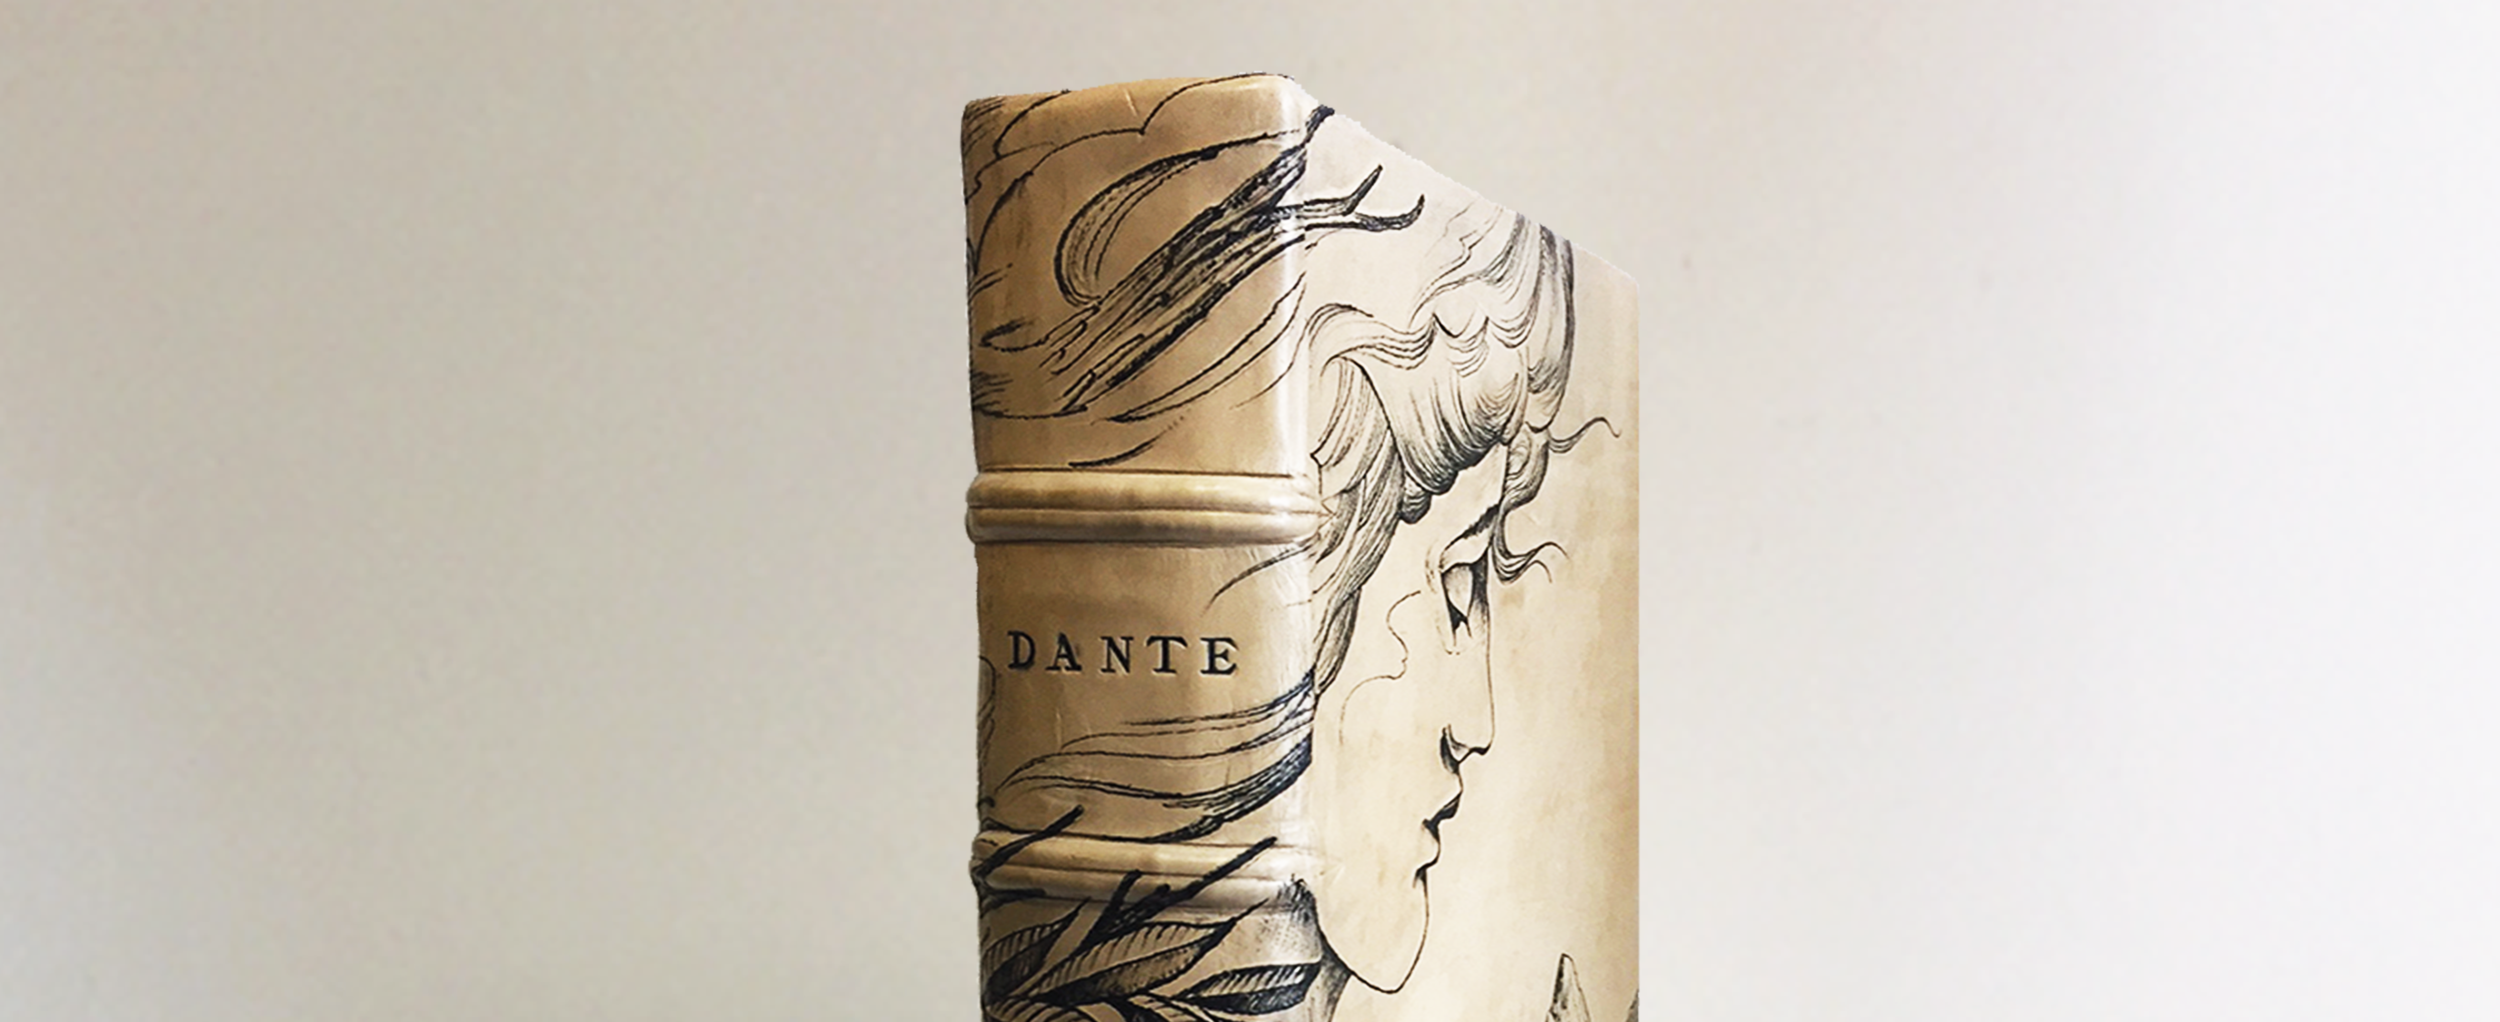 Dante-spine-1.png